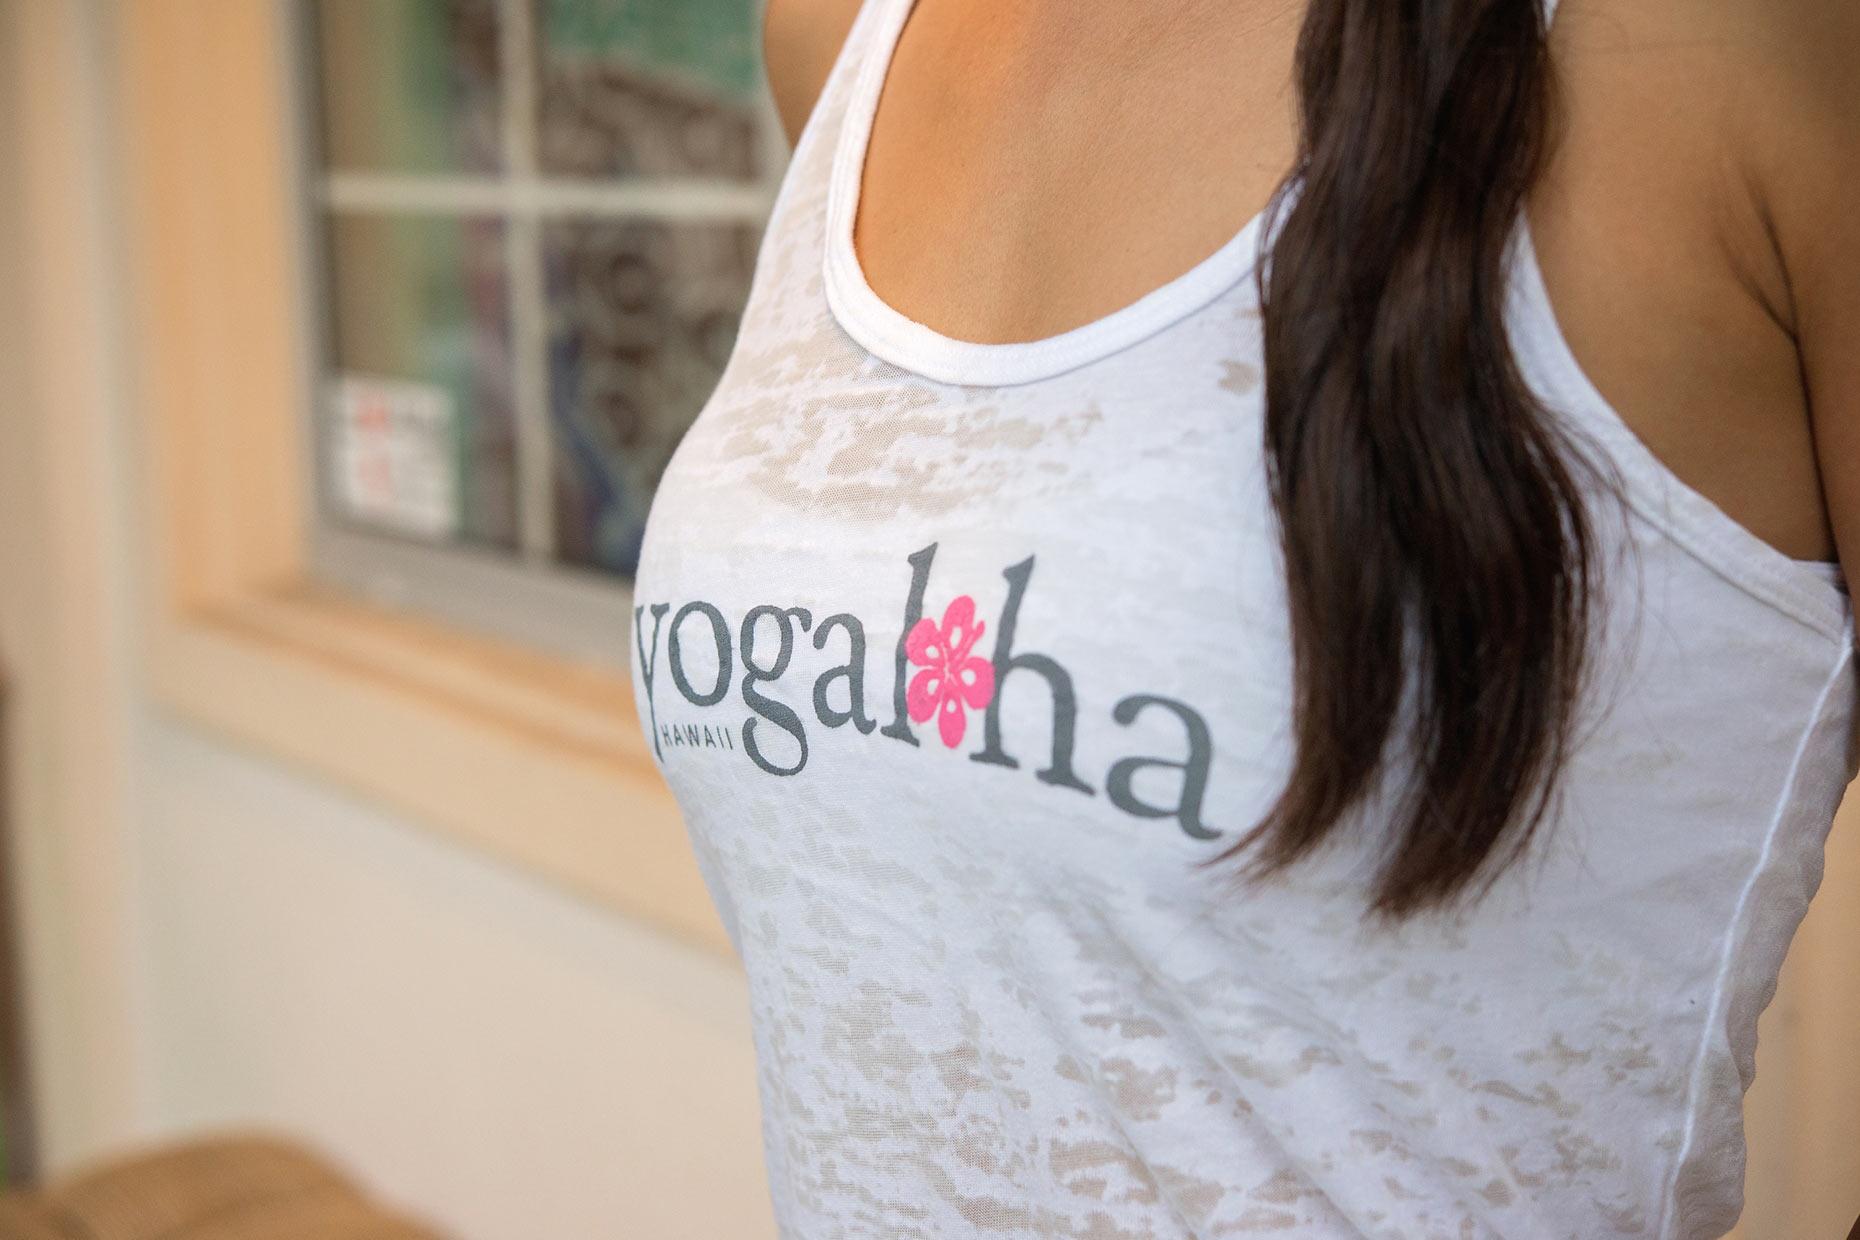 Yogaloha Hawaii tank top